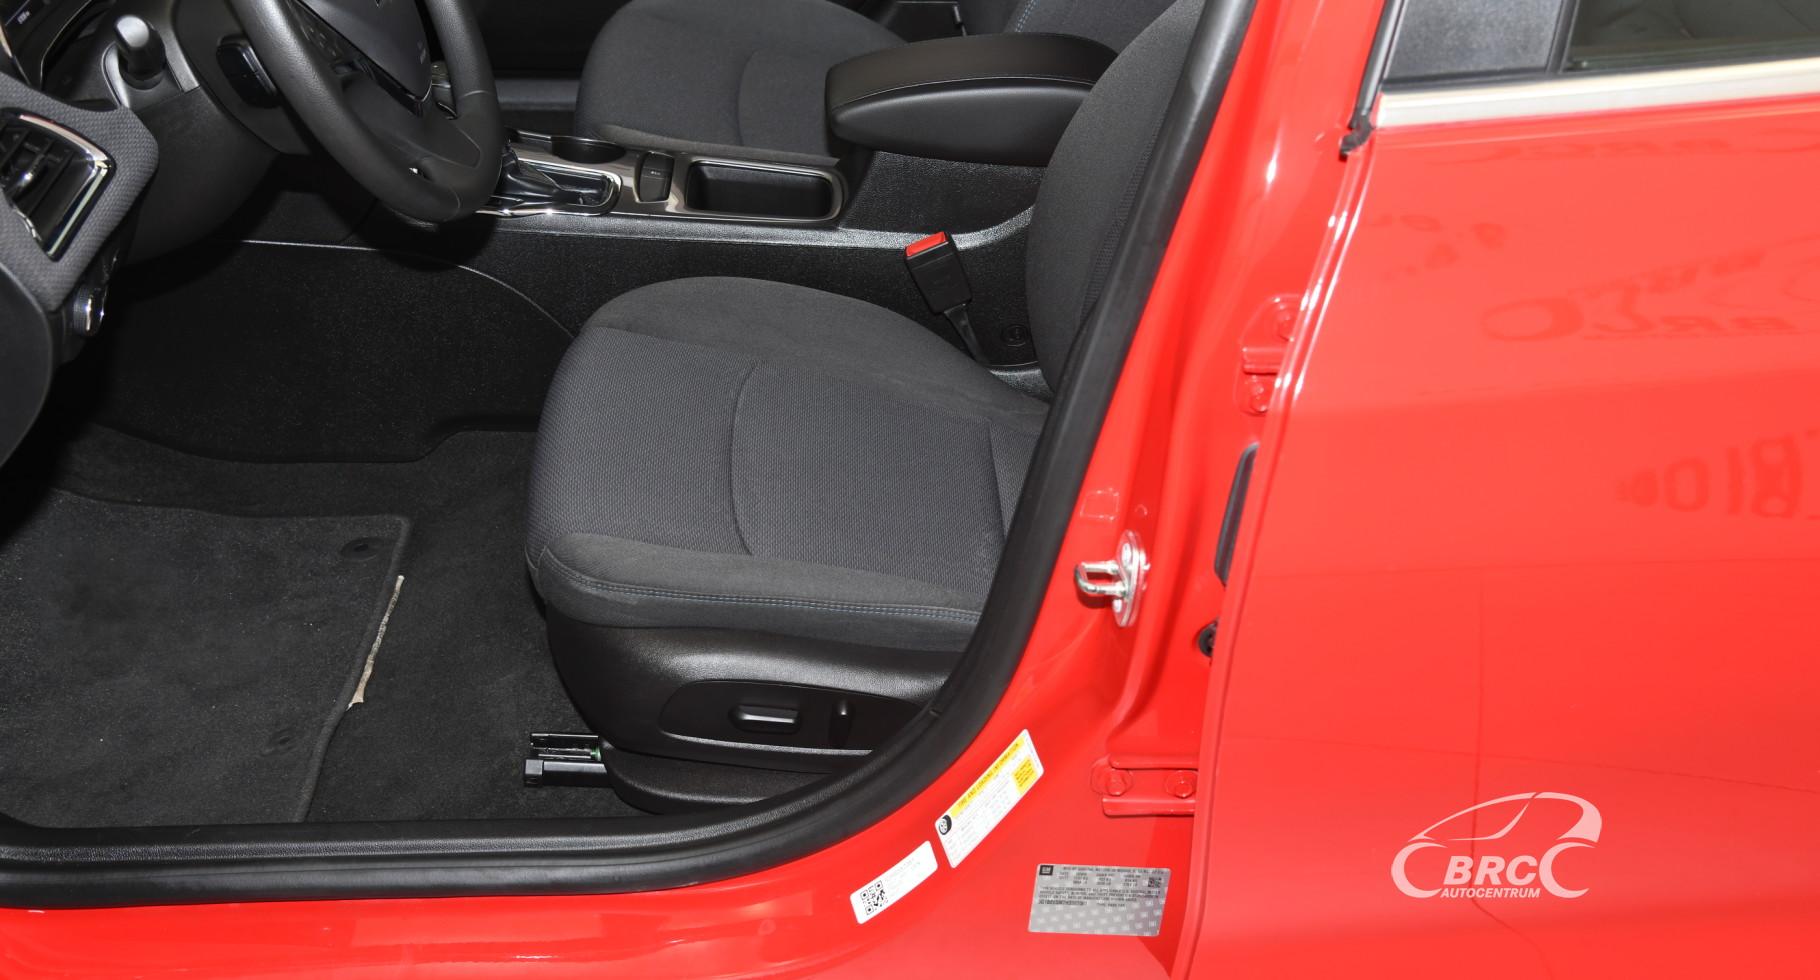 Chevrolet Cruze 1.4i LT Automatas